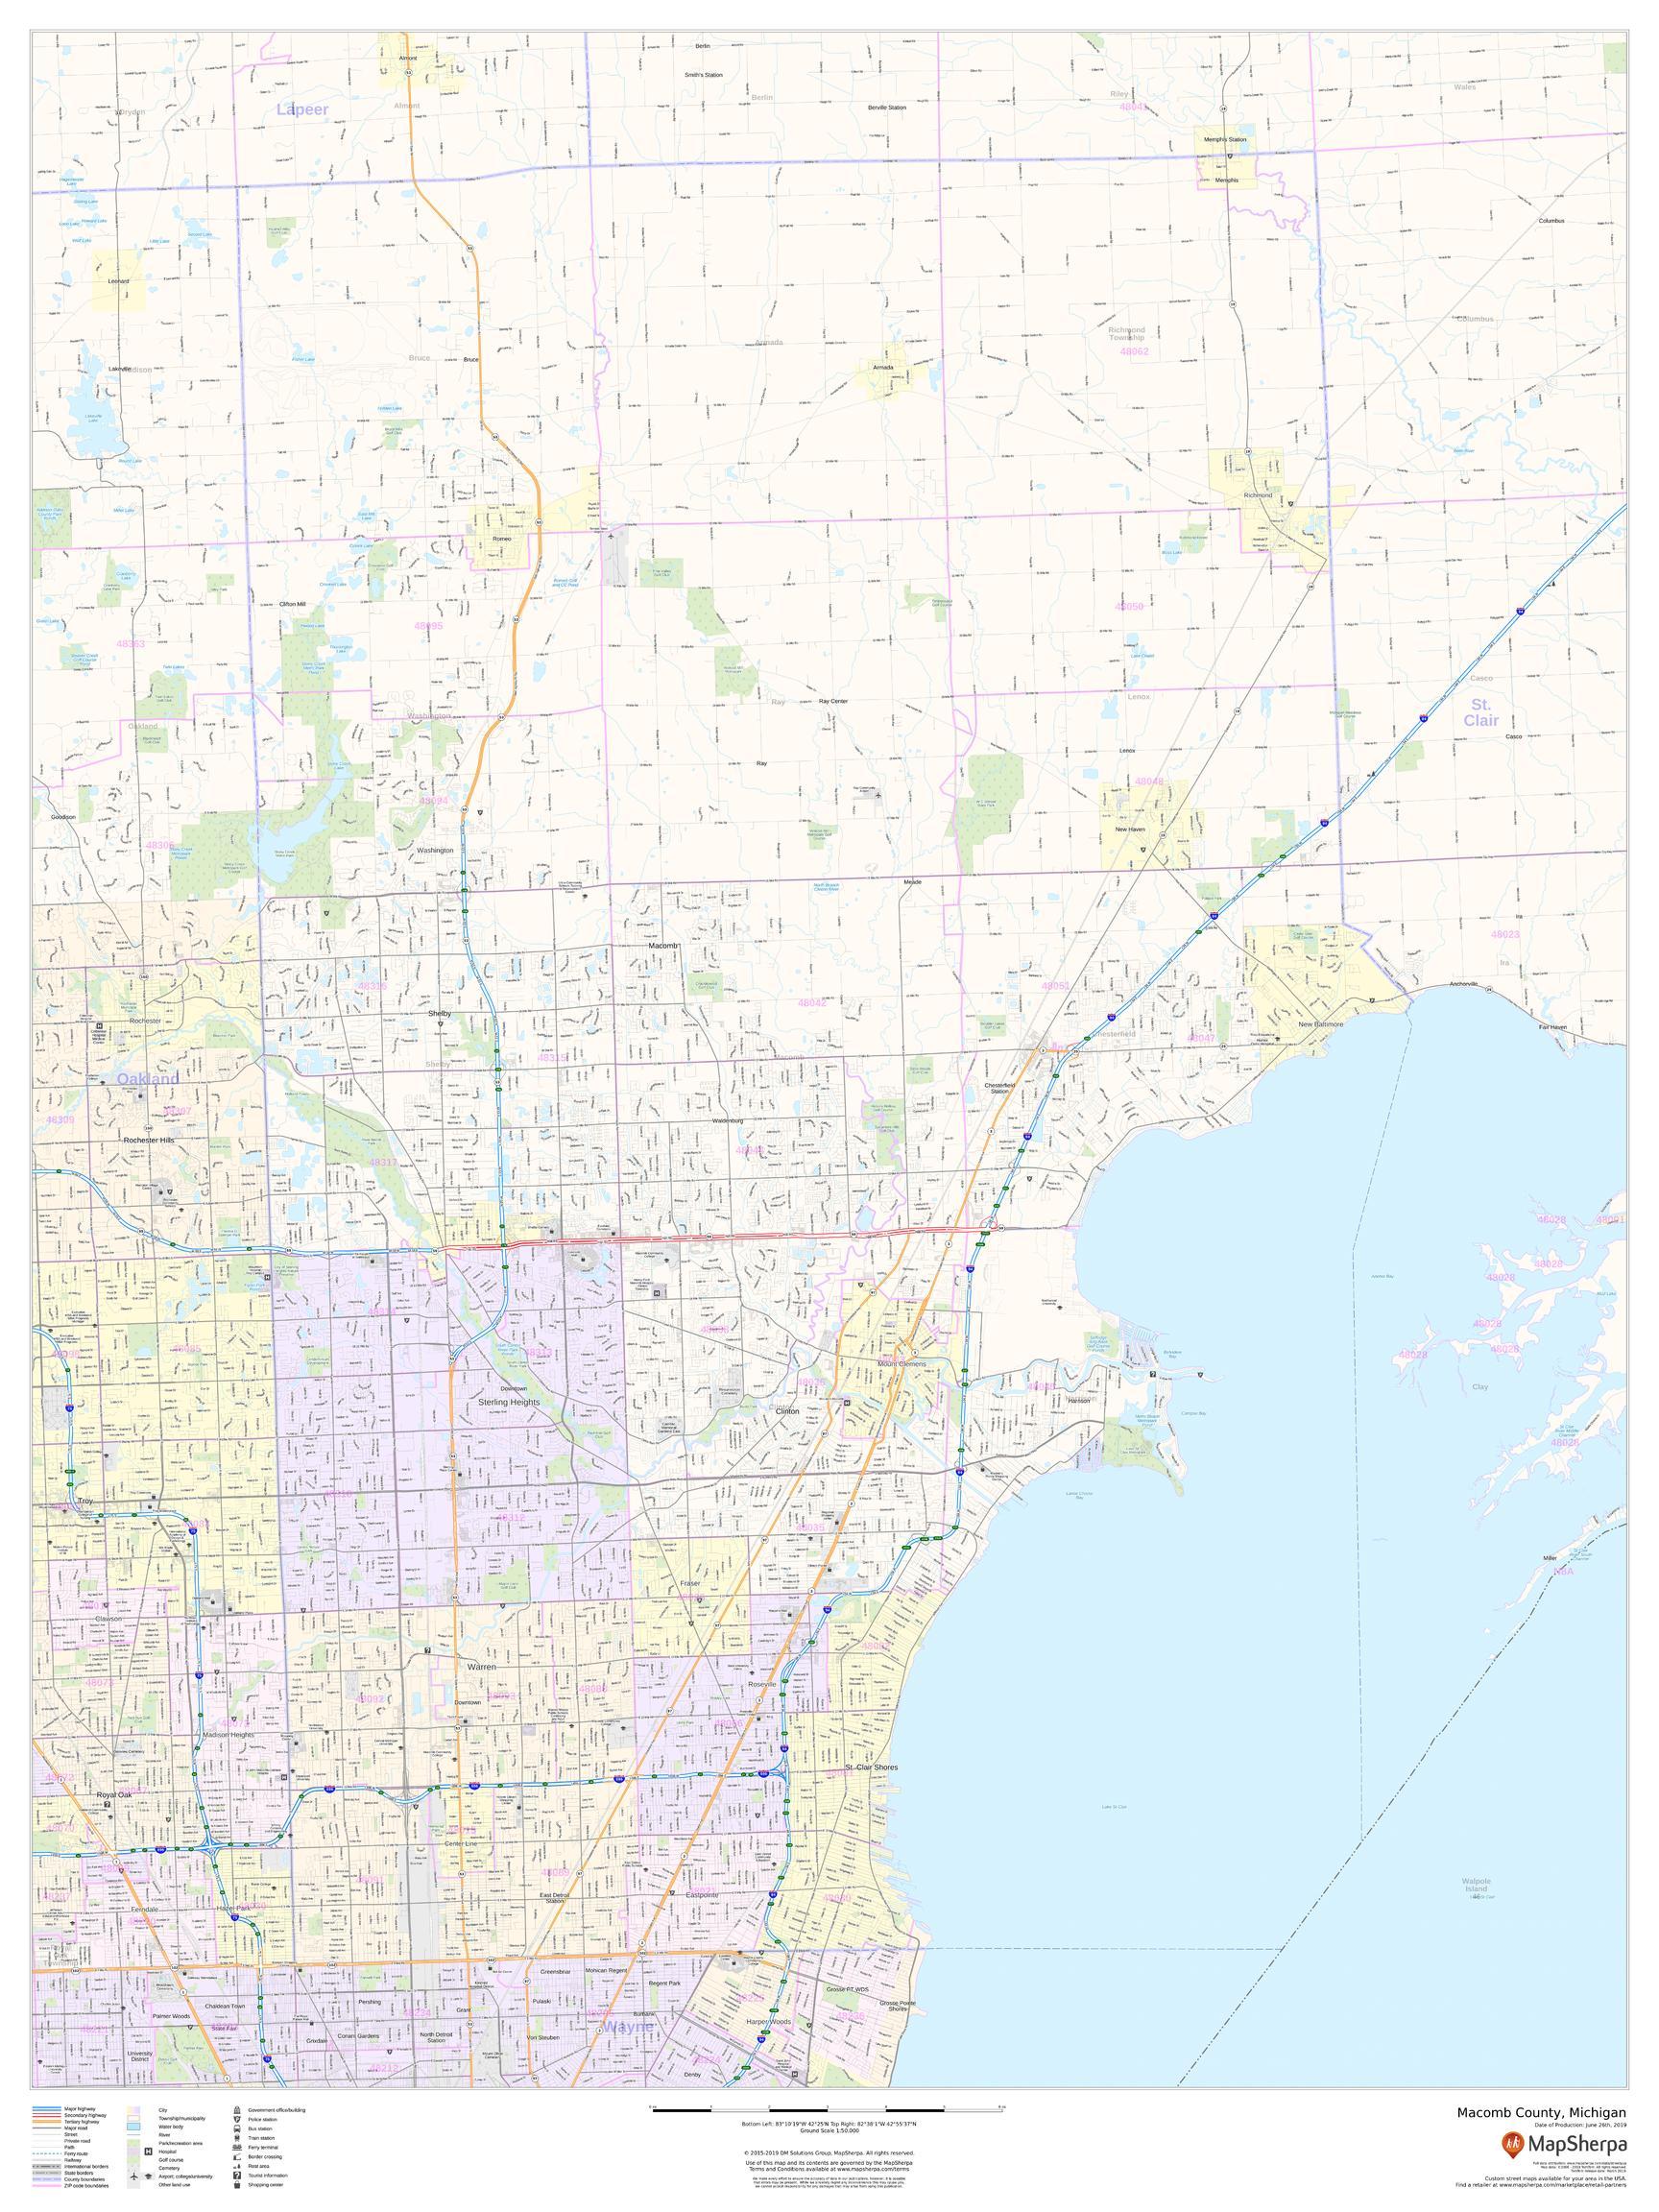 Macomb County, Michigan Map